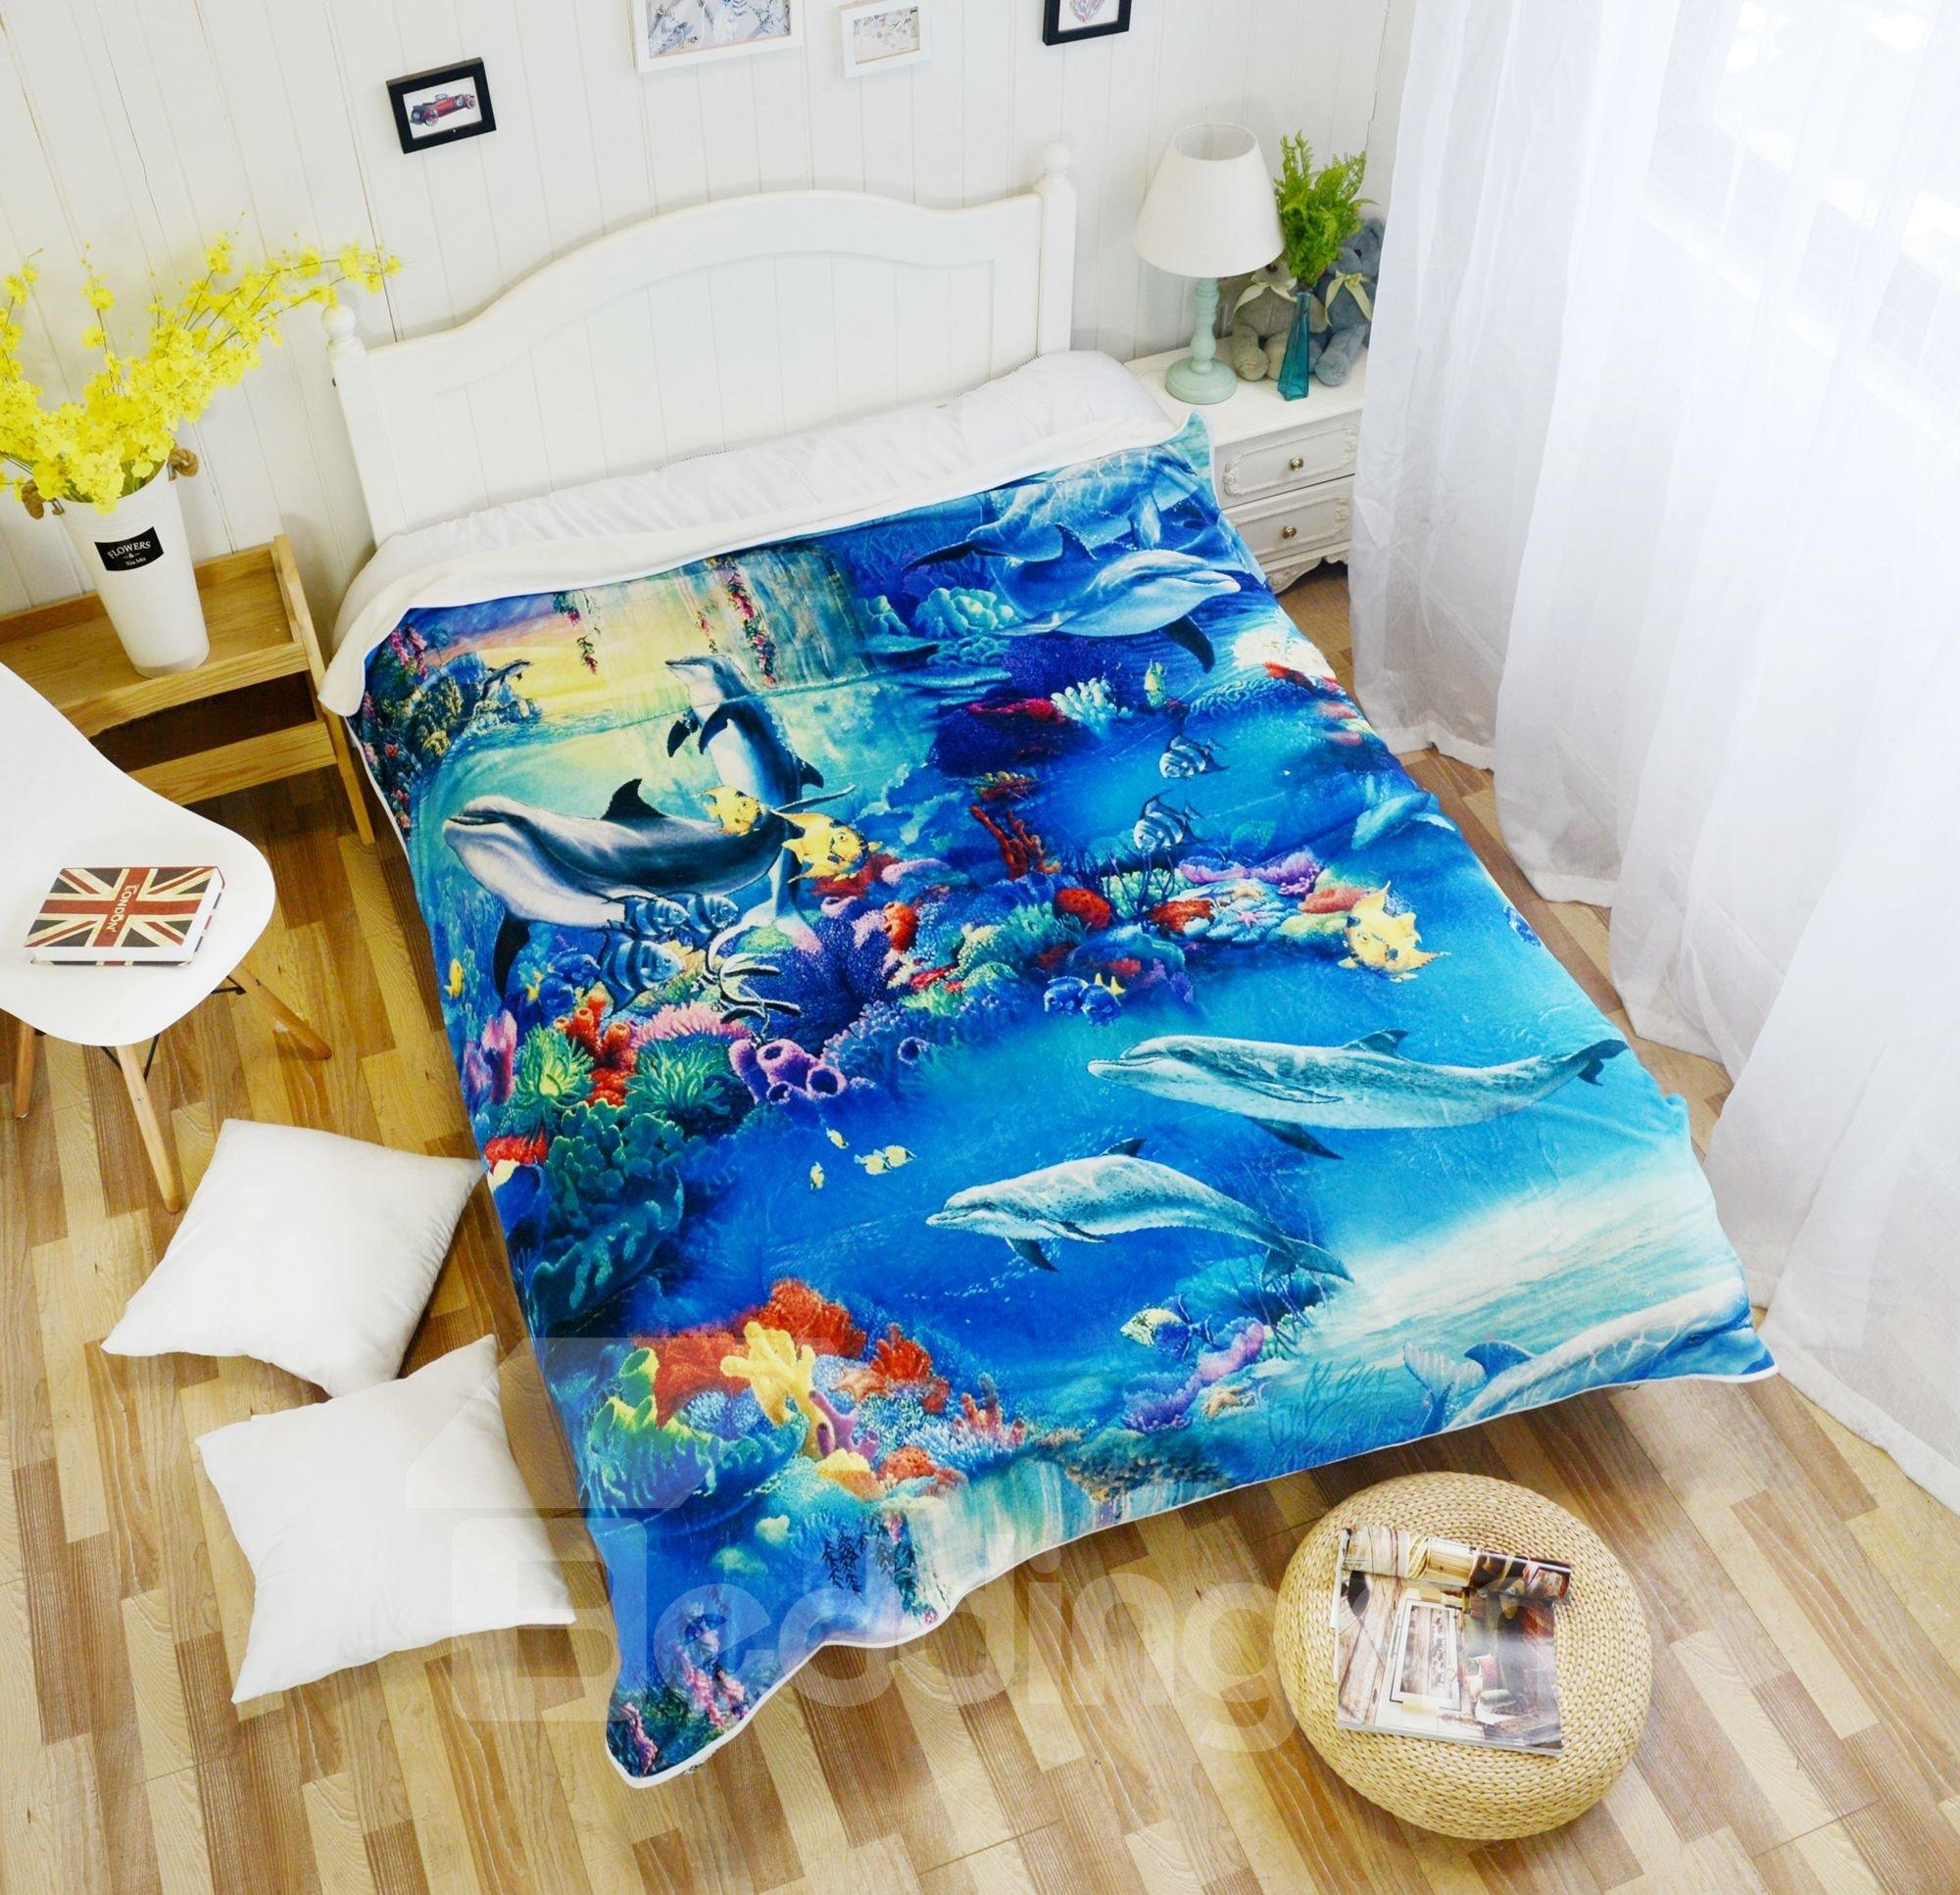 Underwater World and Dolphins Pattern Super Soft Flannel Blankets